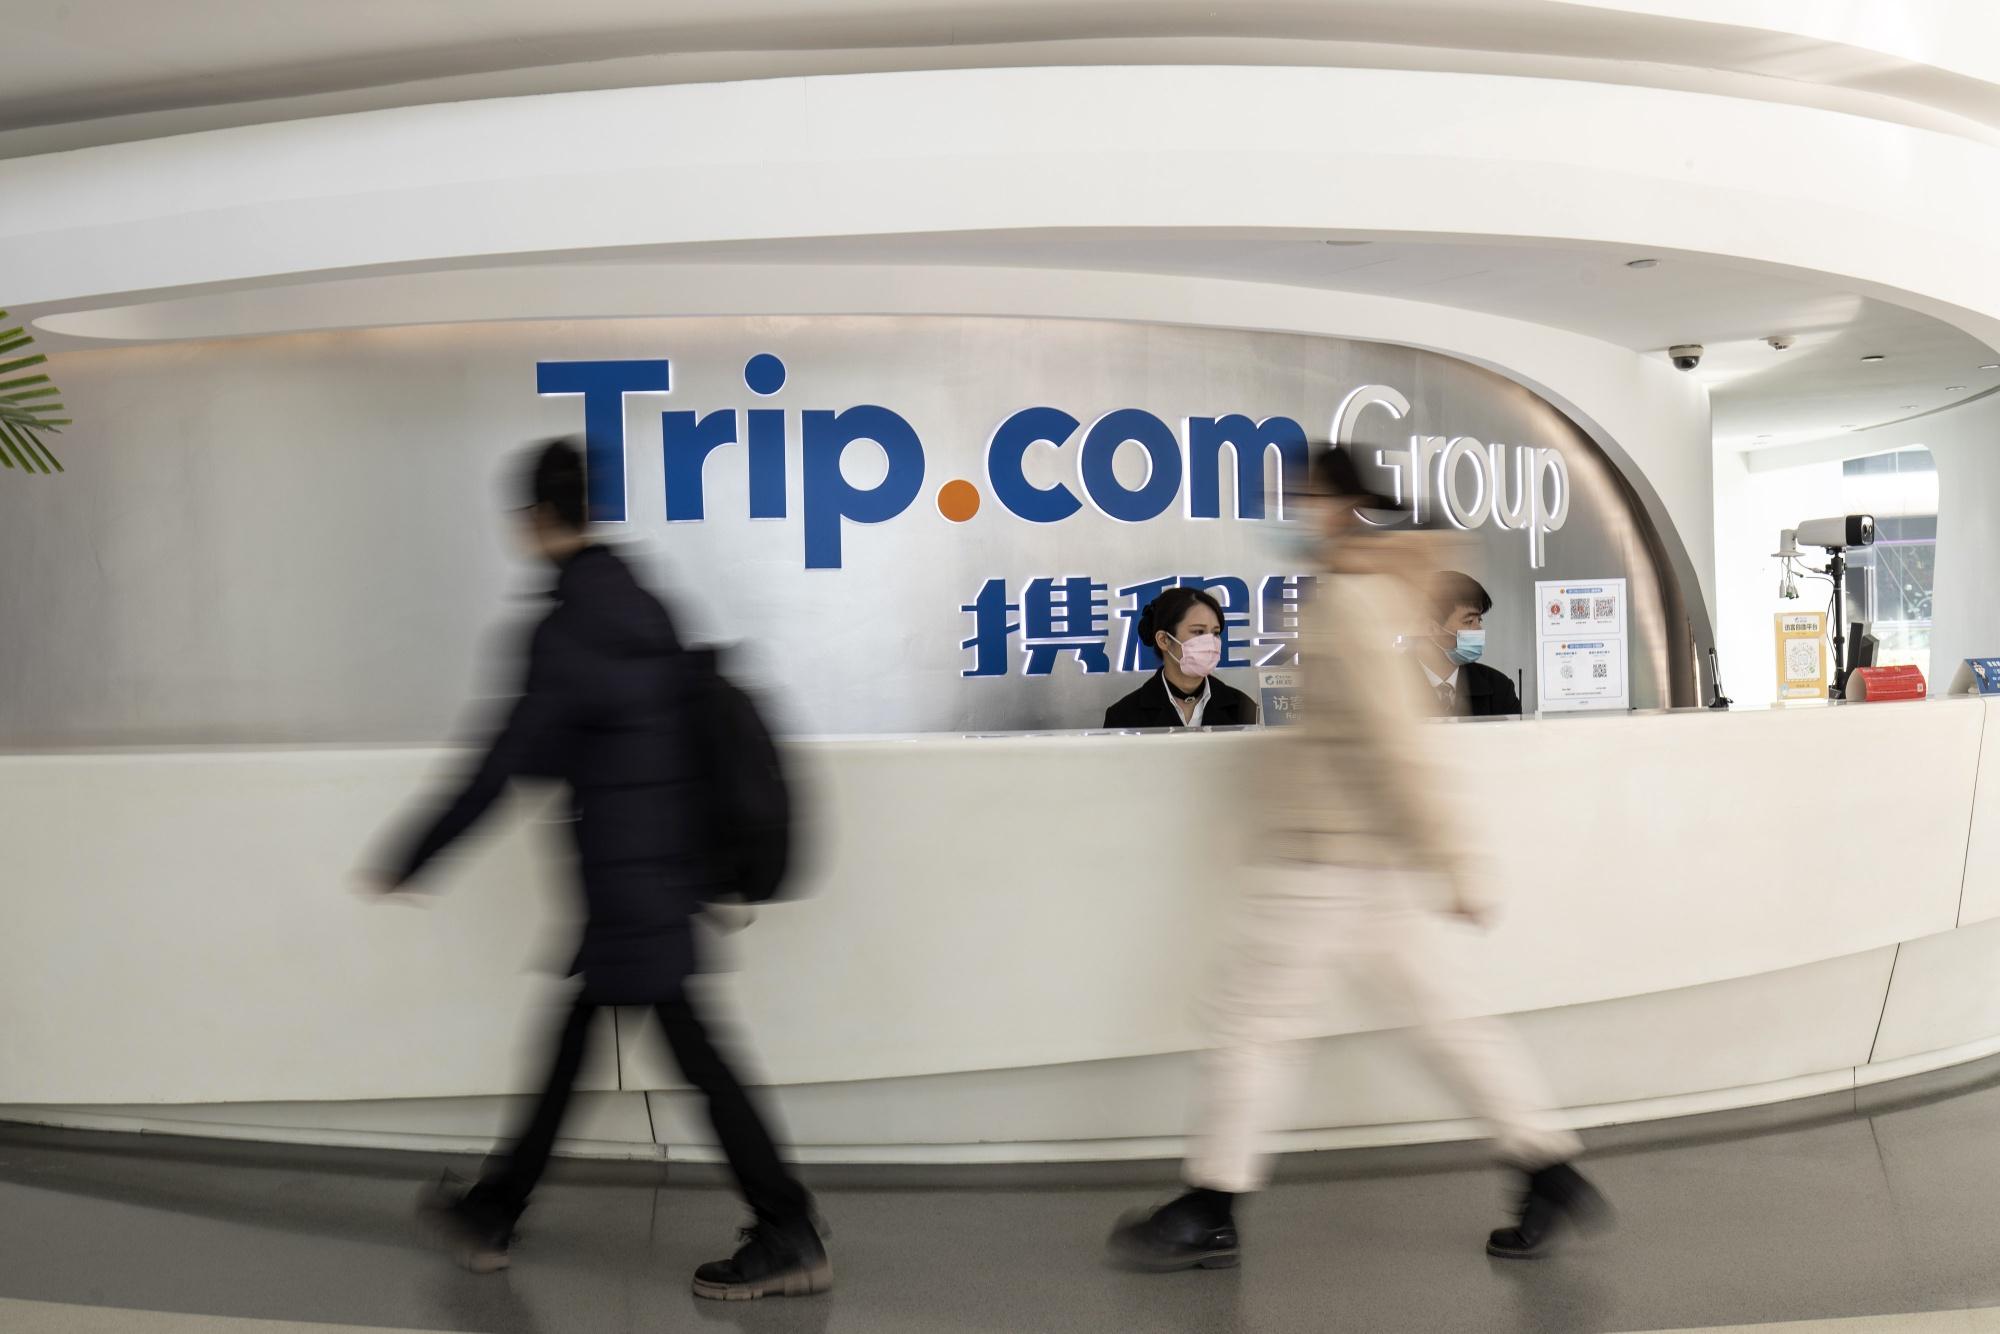 Trip.com headquarters in Shanghai.